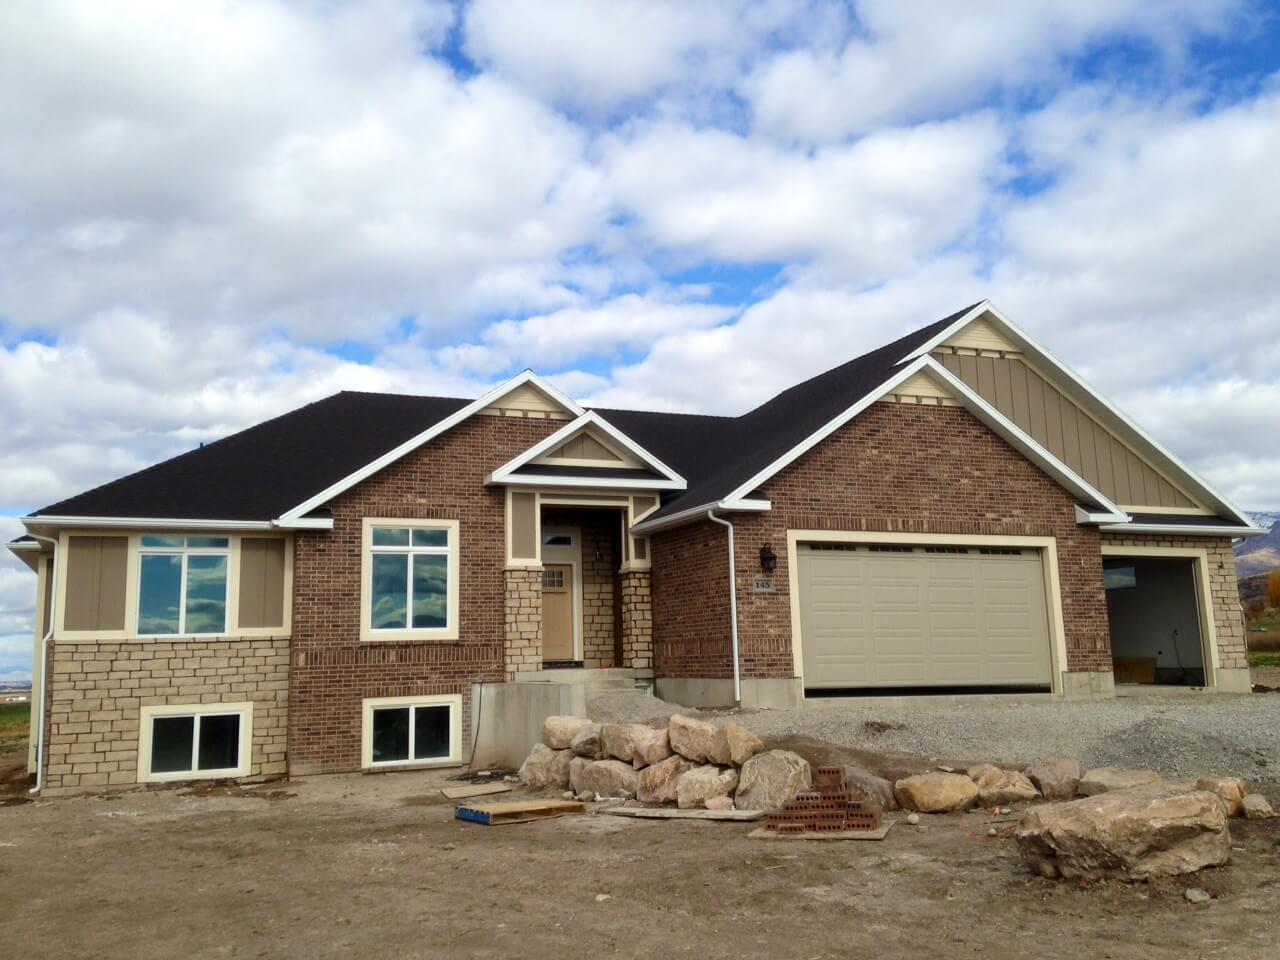 Brick Home Restoration : Home exterior restoration services preston id exterpro inc